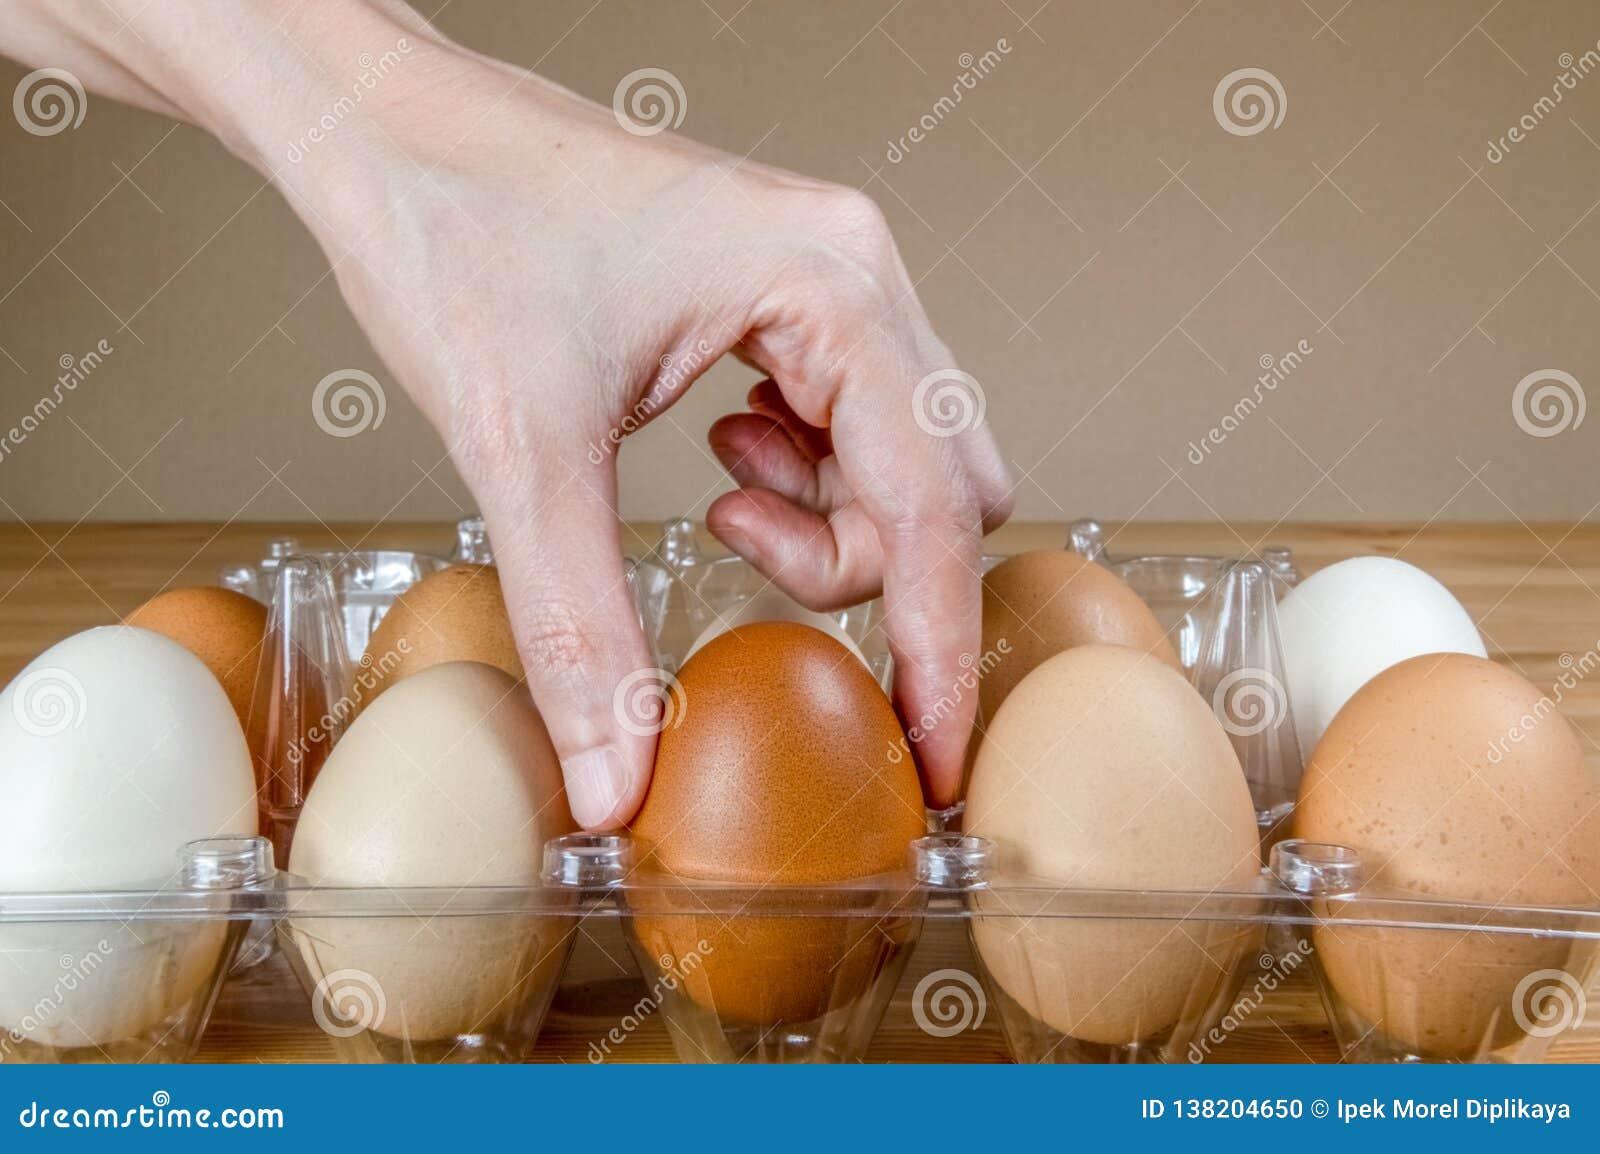 Żeńska ręka podnosi jeden jajko od plastikowego jajecznego pudełka na stole